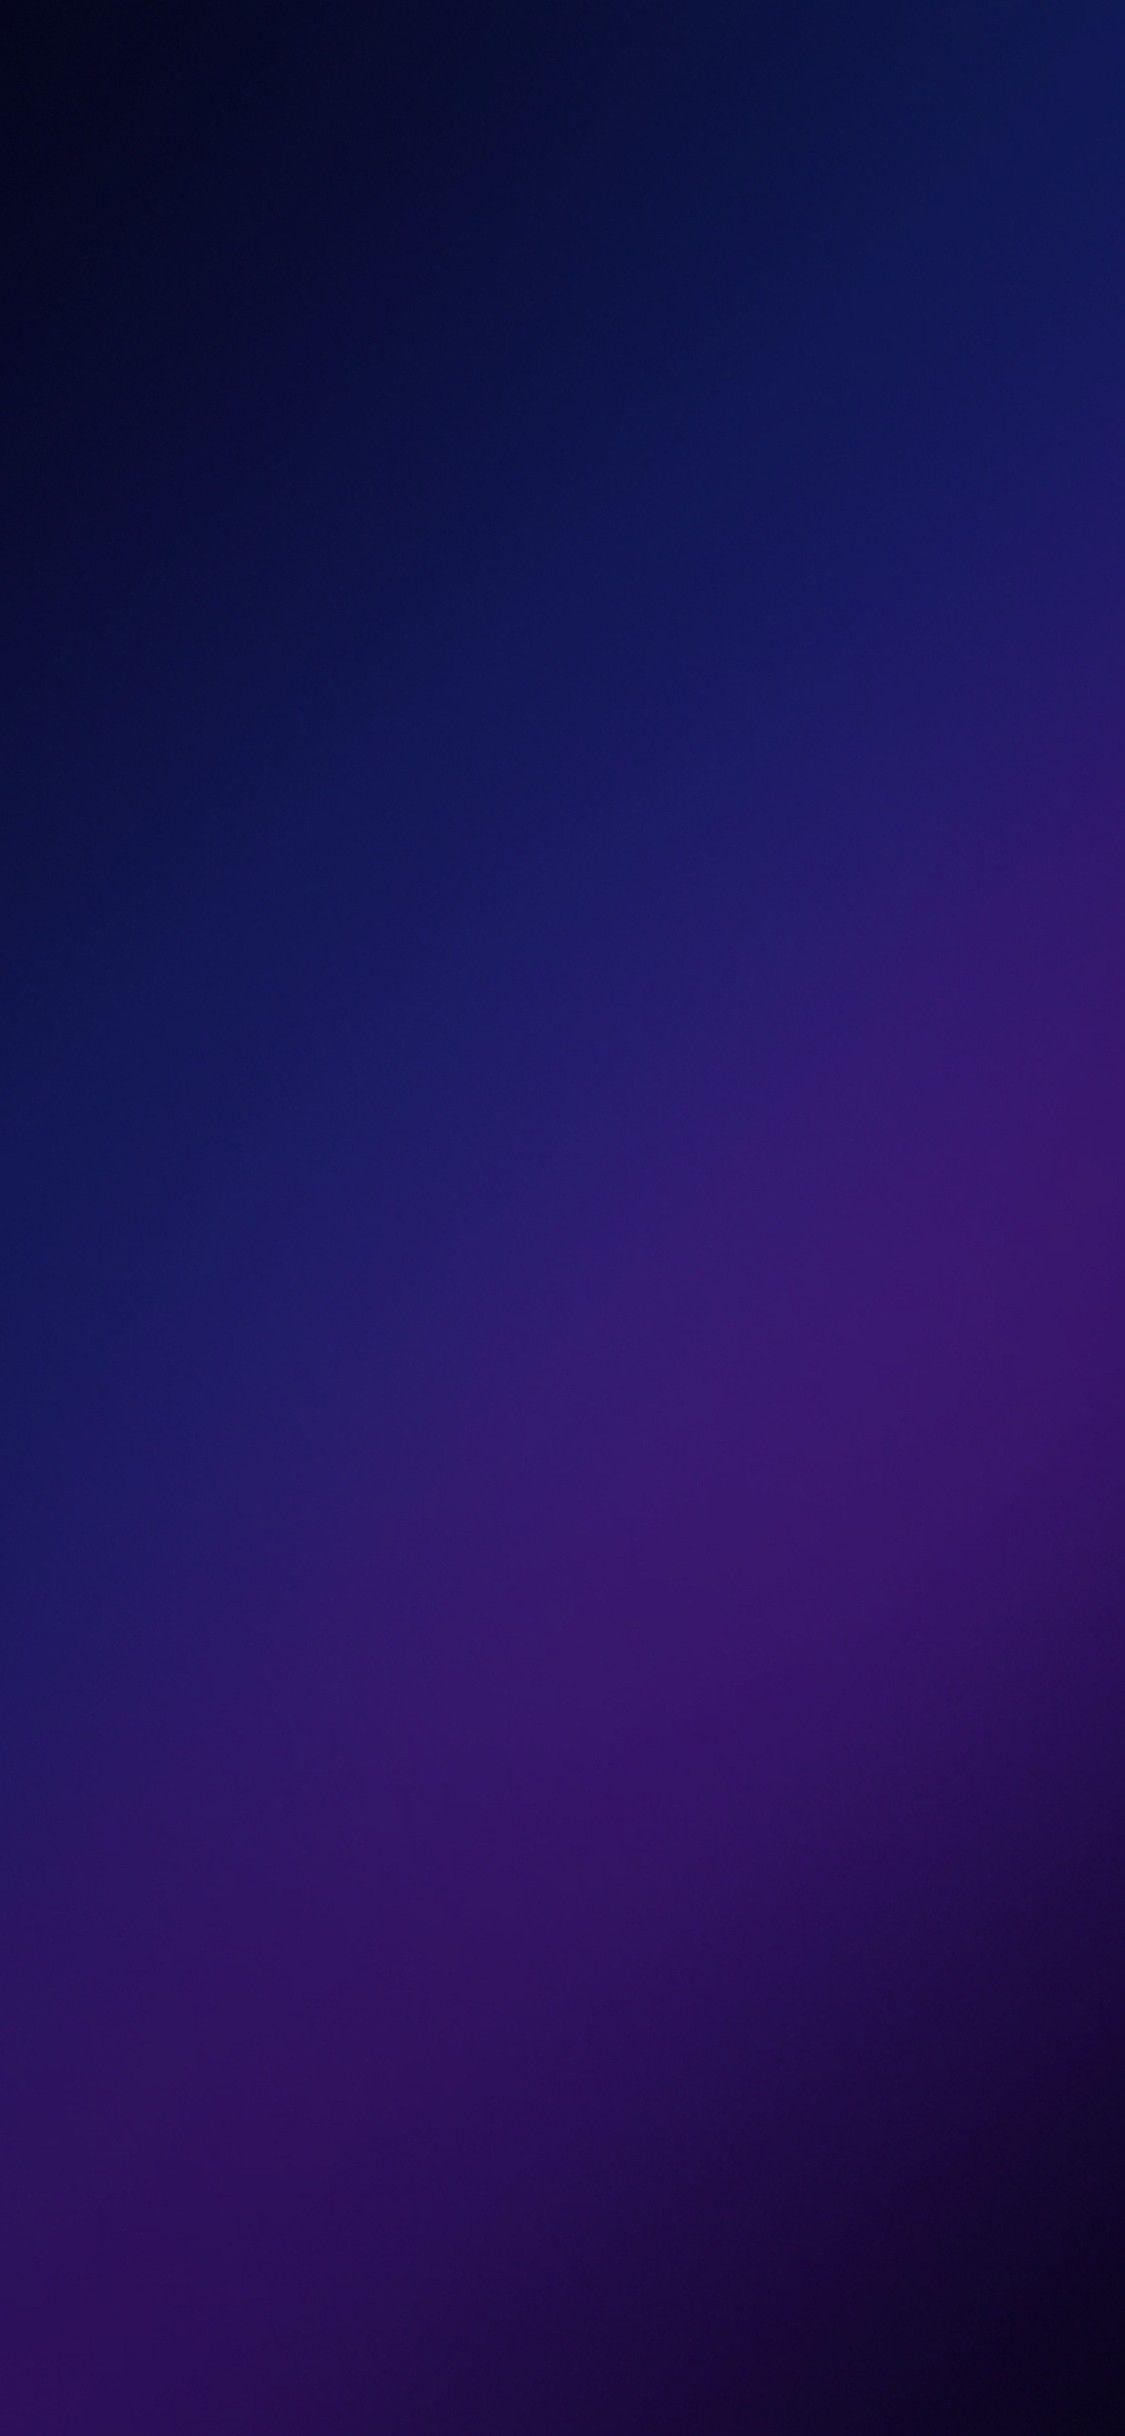 Violet S9 S9 Plus Wallpaper Galaxy Colour Smooth Digital Art